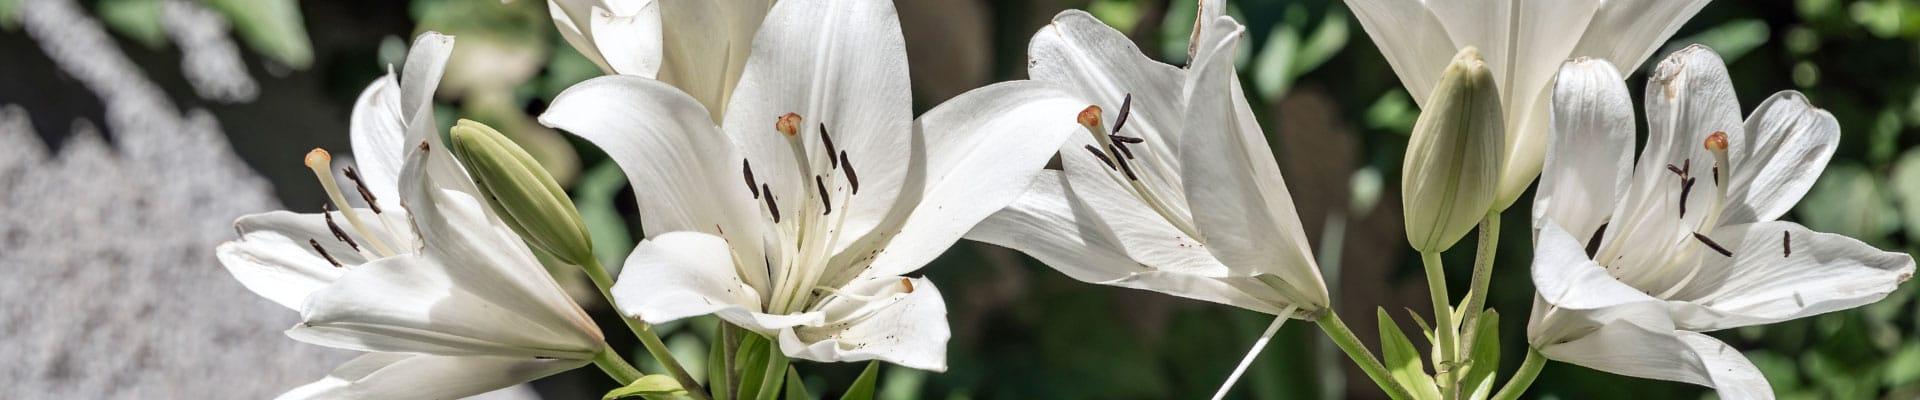 White Lily -header